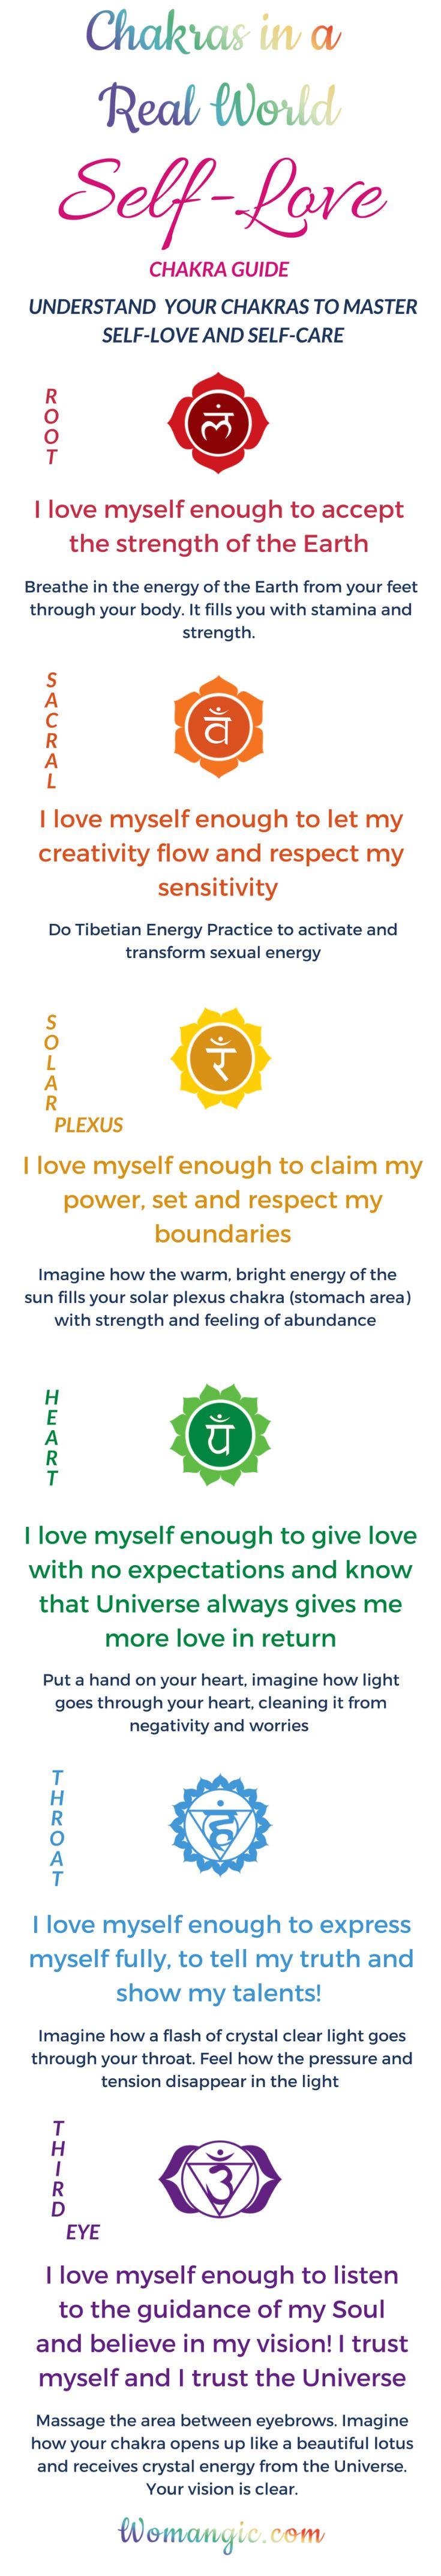 Self-love | Women self-love | Self-love help | Self love ideas | Self love meditation | Self care | Mindset | Positive | Mindfulness | Self care routine | Self care ideas. Chakra, Chakra Balancing, Root, Sacral, Solar Plexus, Heart, Throat, Third Eye, Crown, Chakra meaning, Chakra affirmation, Chakra Mantra, Chakra Energy, Energy, Chakra articles, Chakra Healing, Chakra Cleanse, Chakra Illustration, Chakra Base, Chakra Images